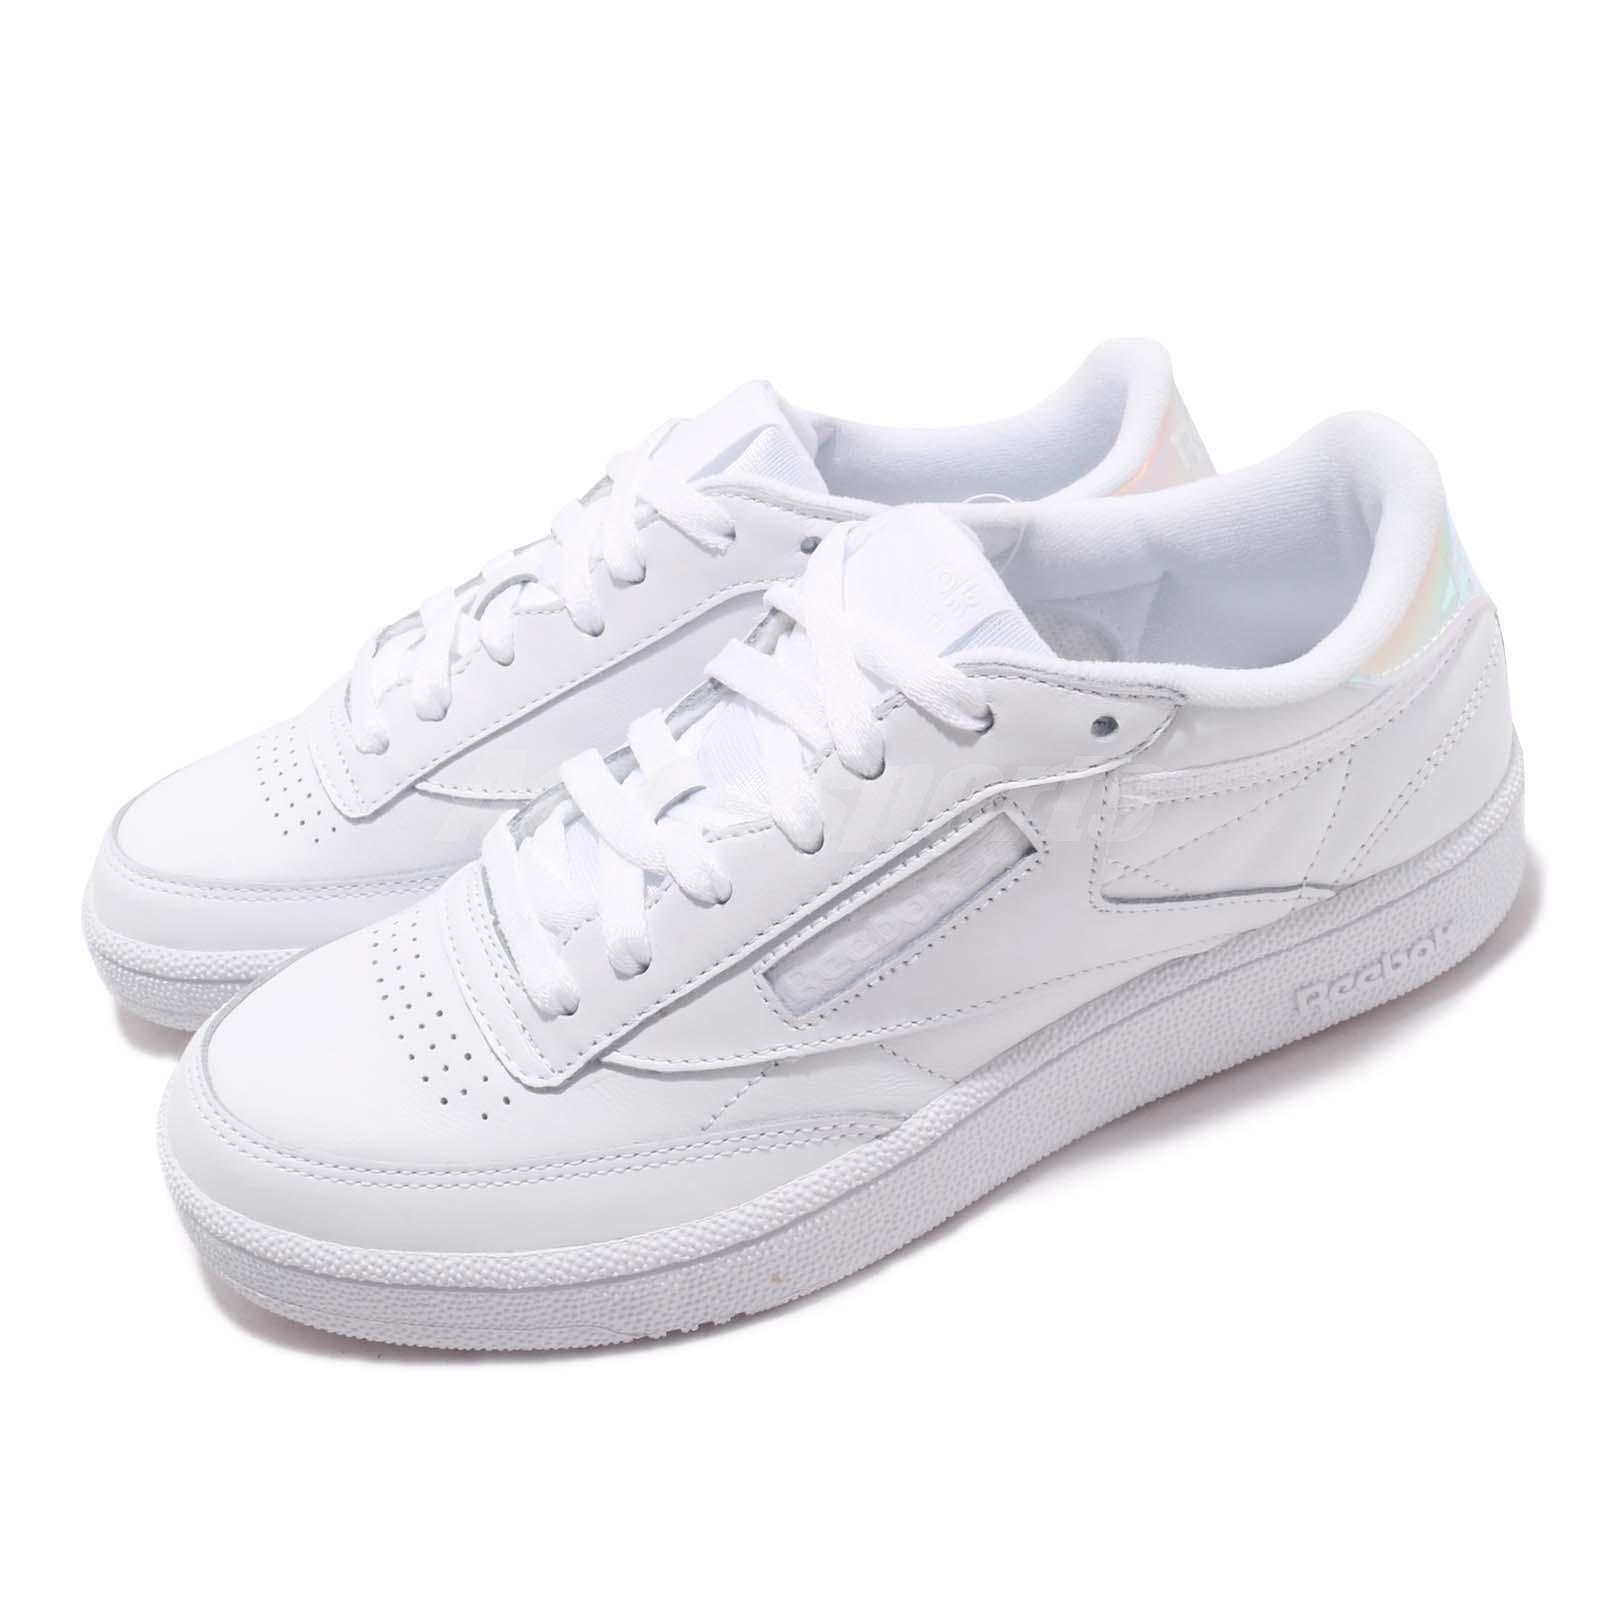 31ae329809571 Reebok Club C 85 MU White Iridescent Hologram Men Casual Shoes ... reebok  club